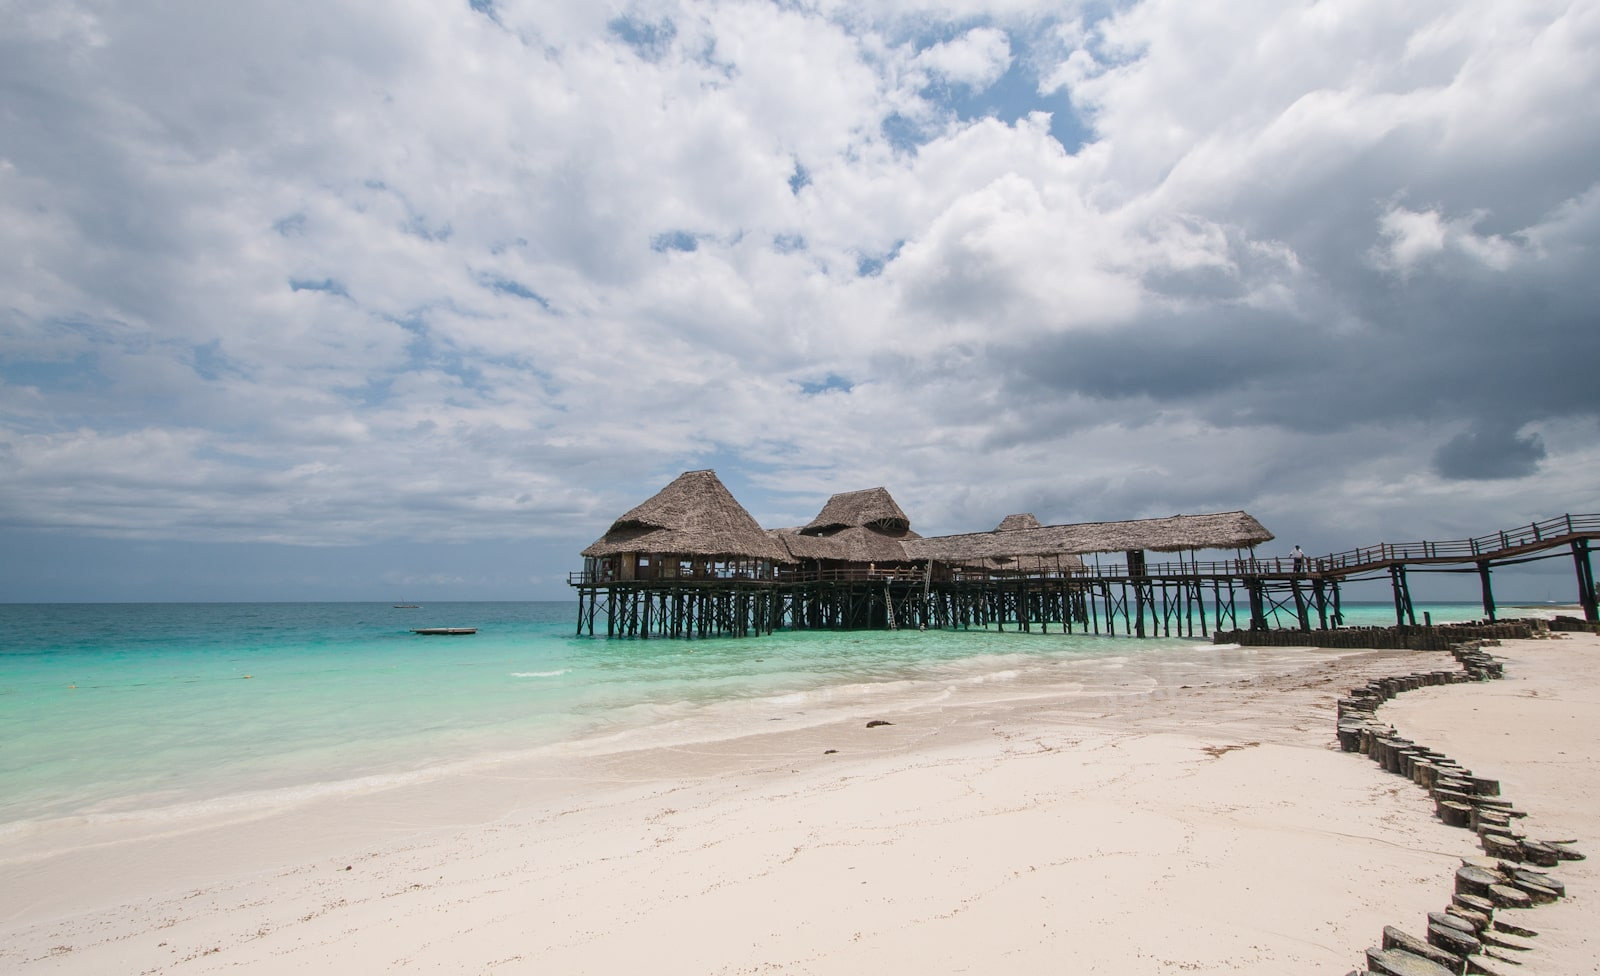 Kendwa Beach on Zanzibar Island